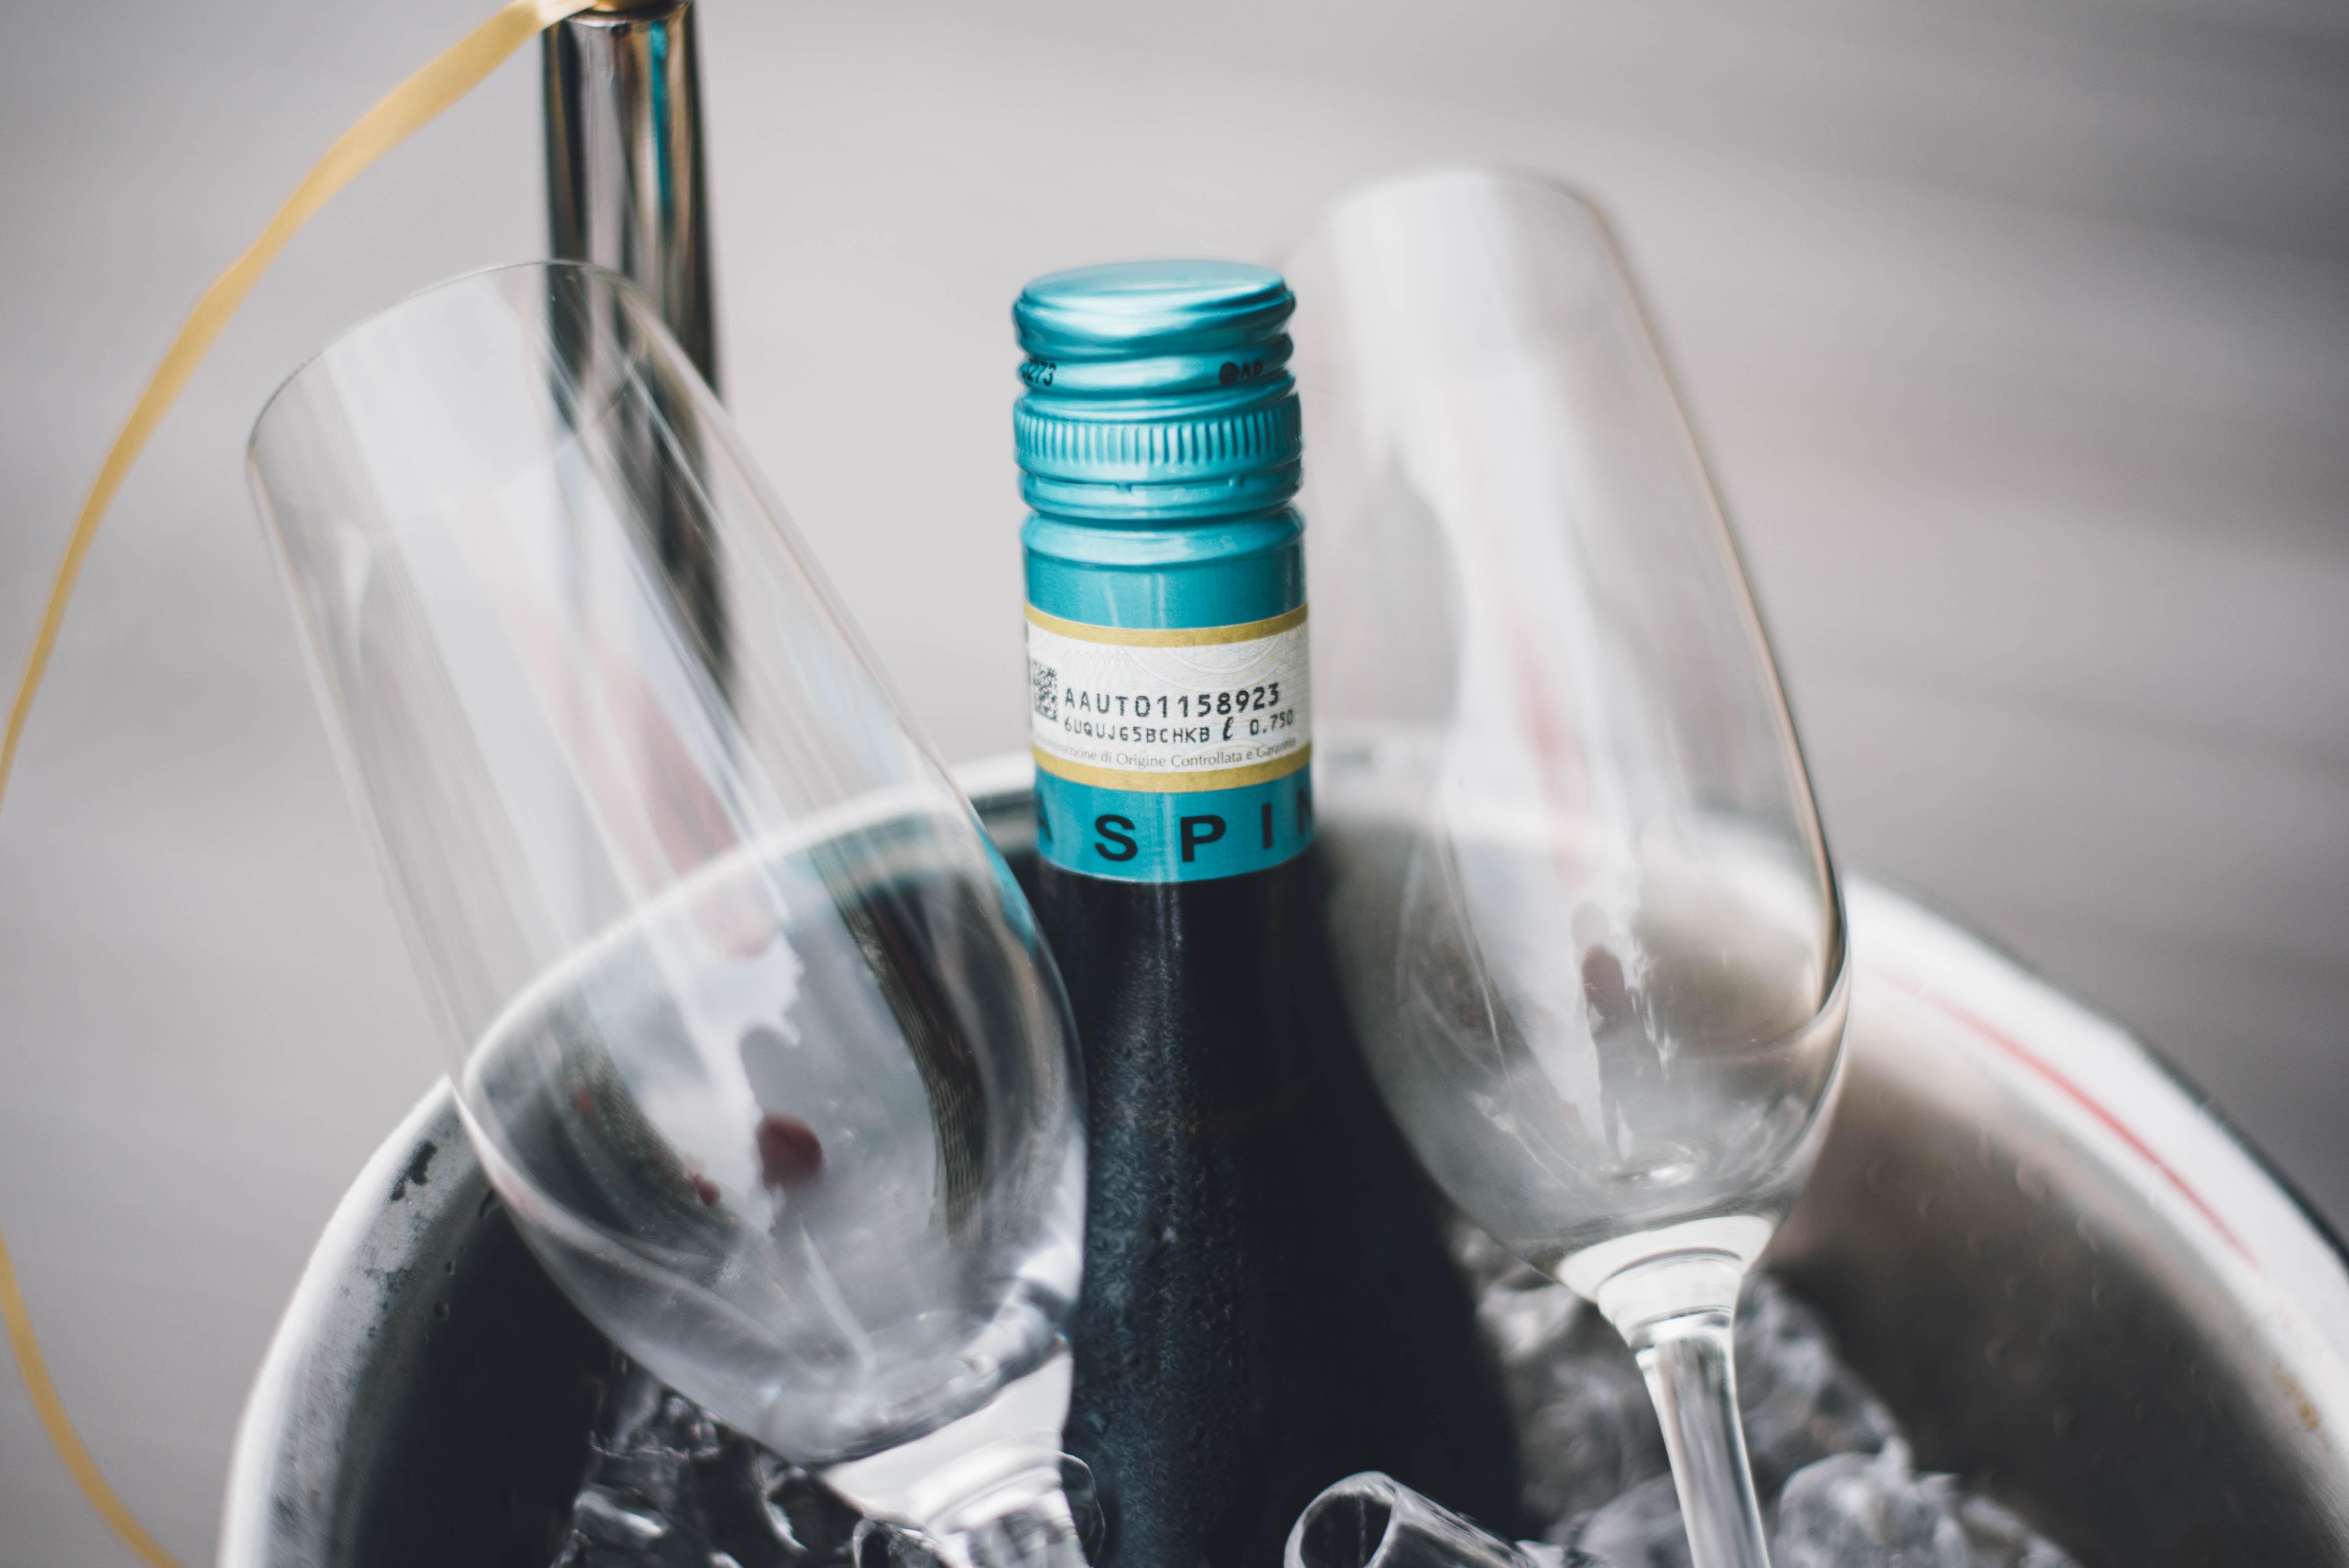 wine bottle beside two flute glasses in macro photography